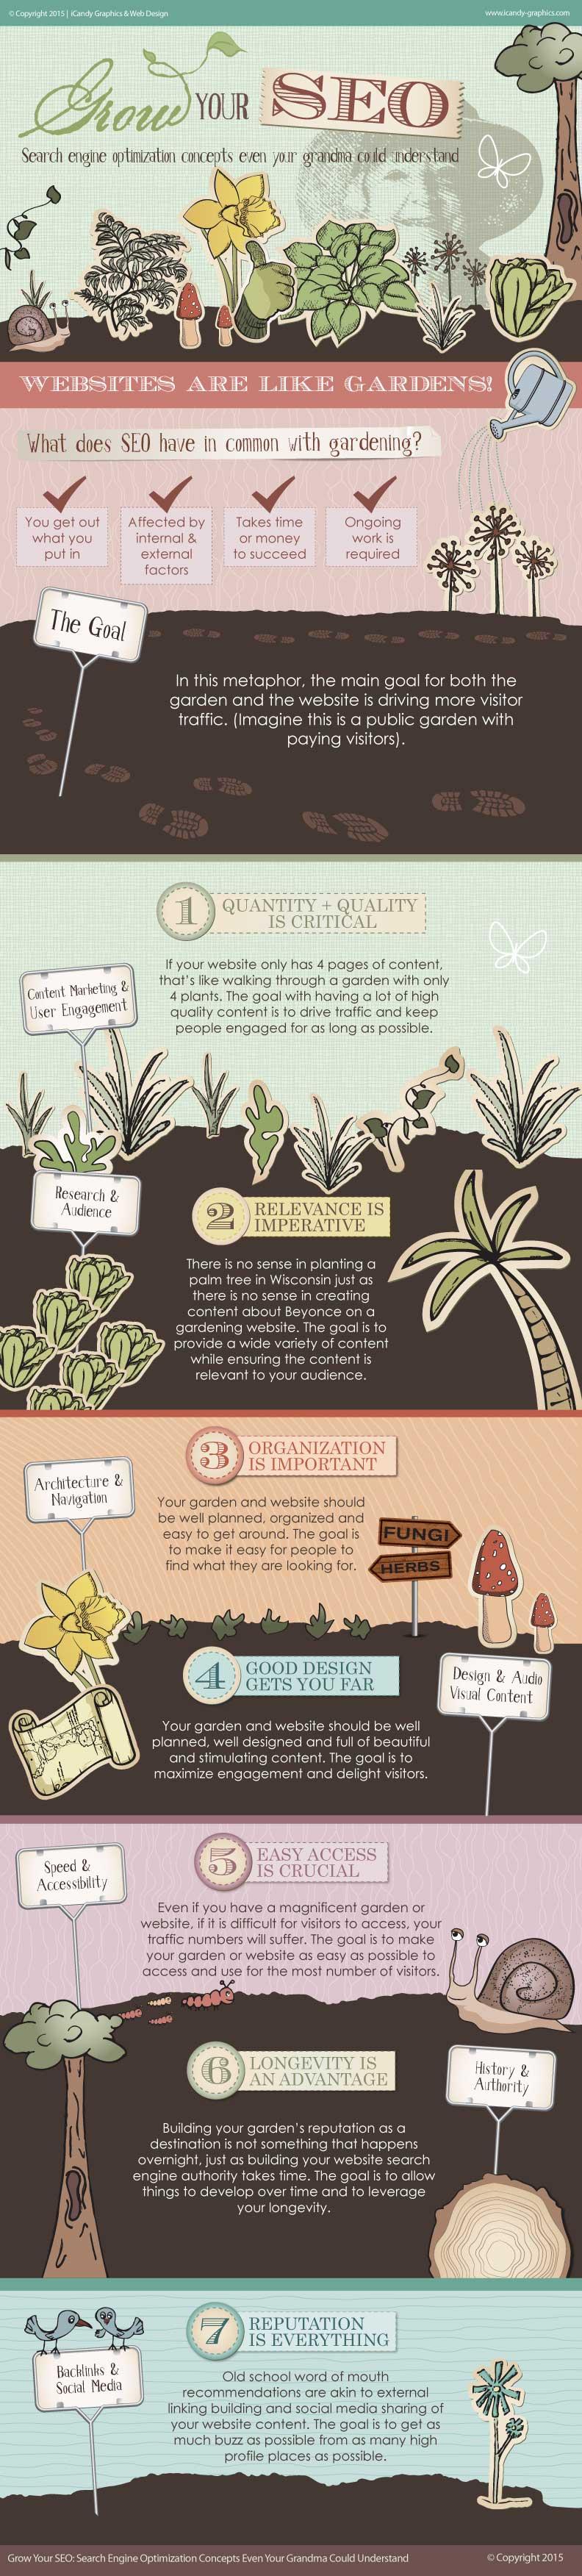 infographie-referencement-metaphore-jardin